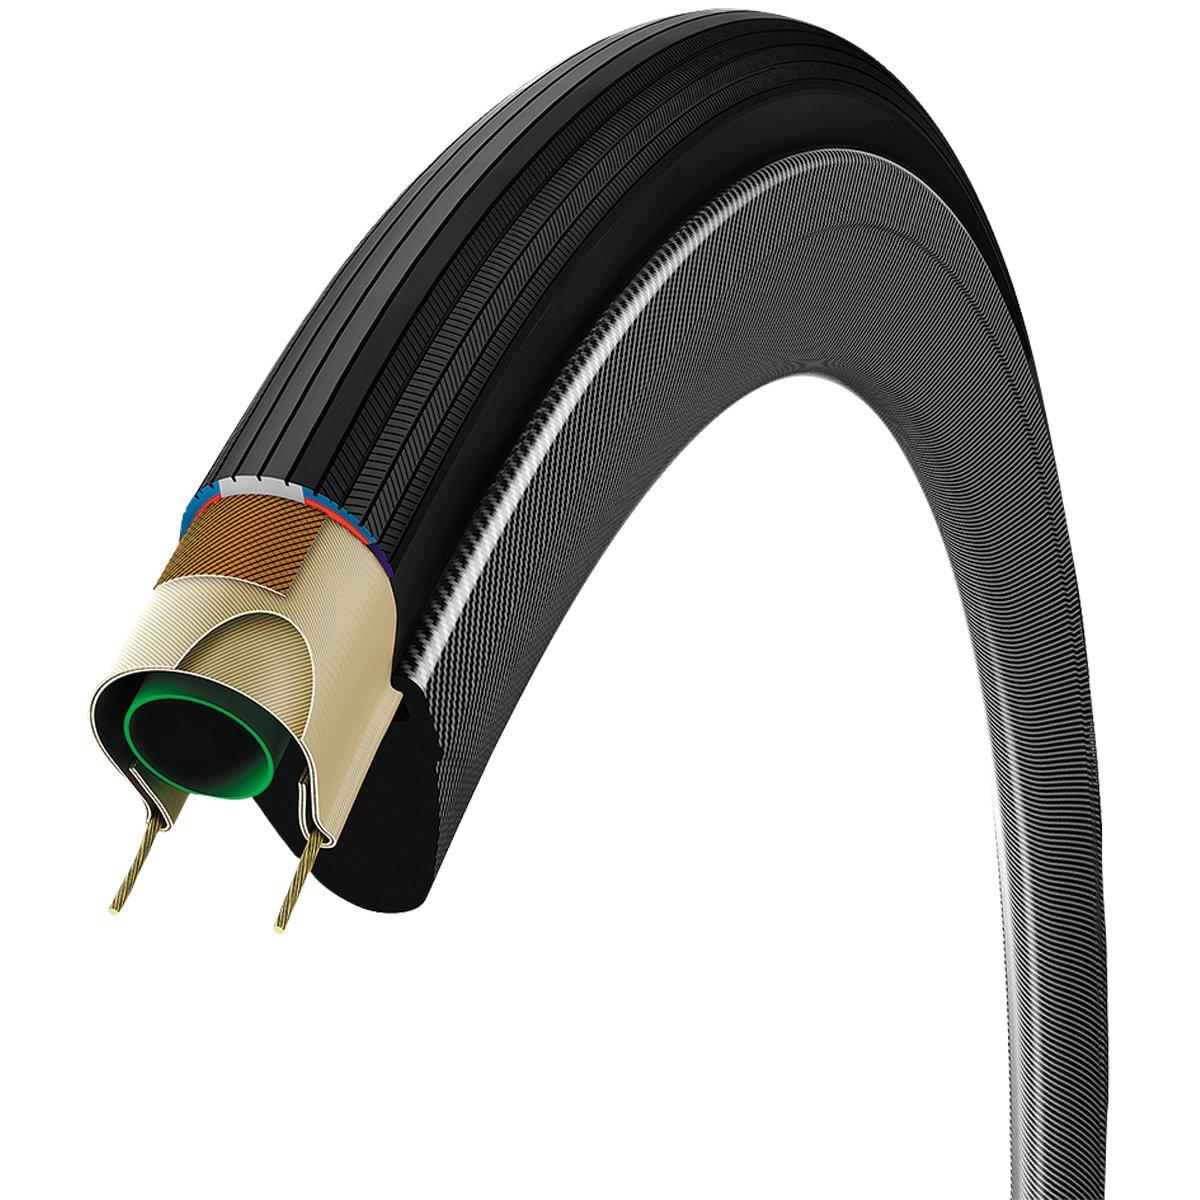 Vittoria Corsa Control G Plus Clincher Tire Black/Black, 700c x 28mm